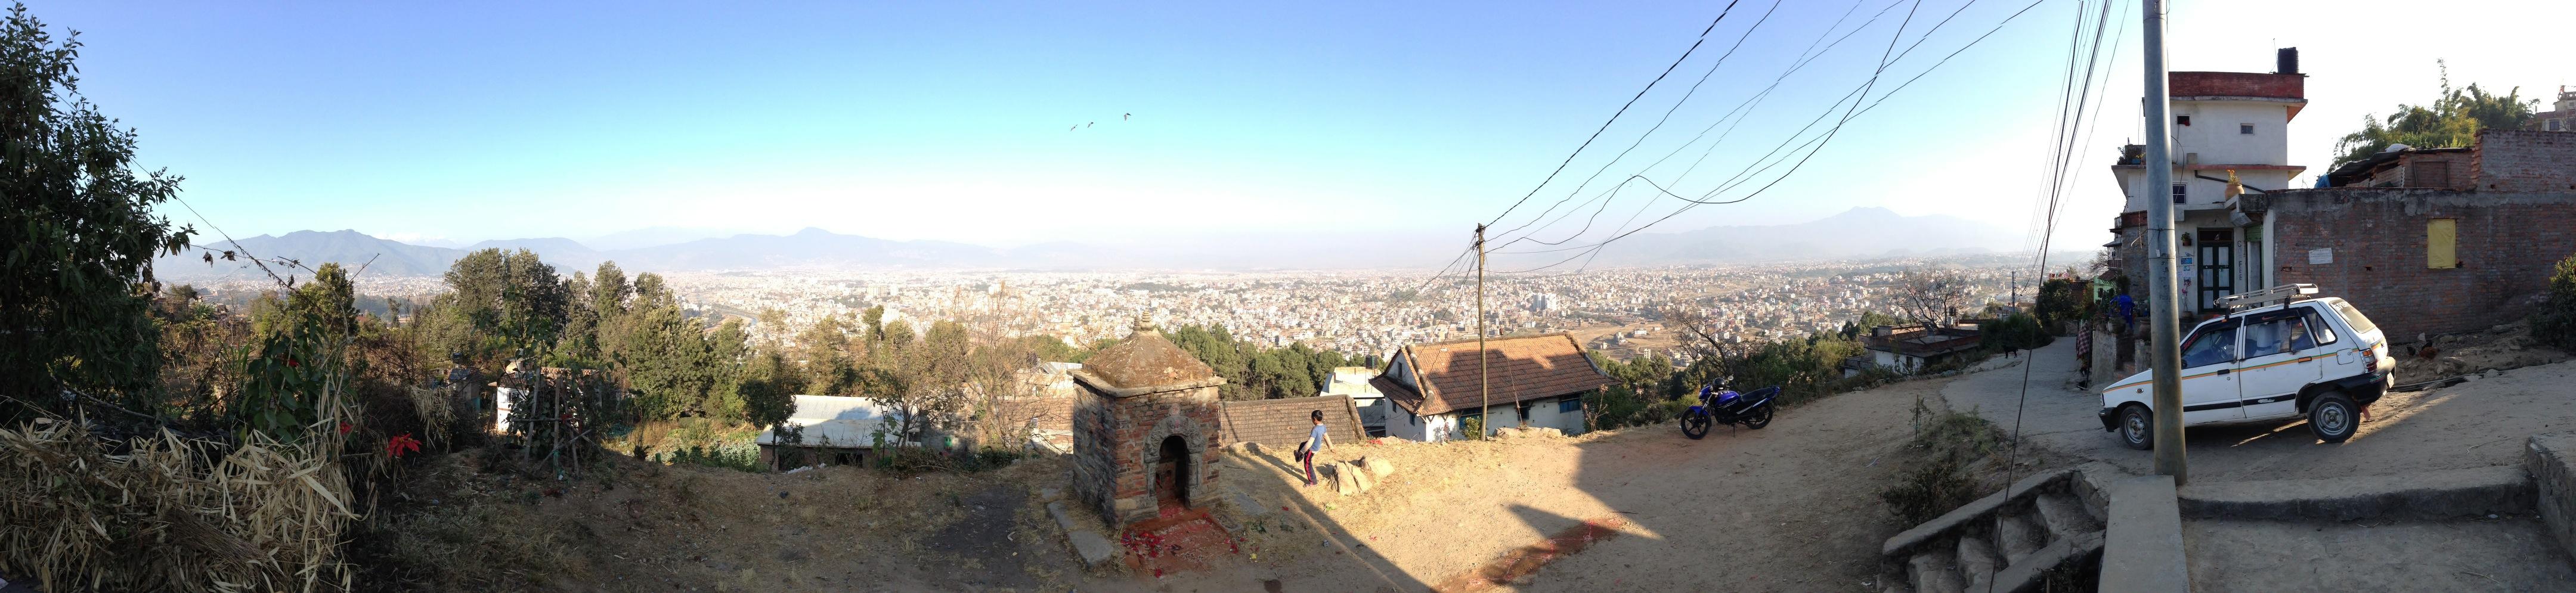 Ausblick auf Kathmandu